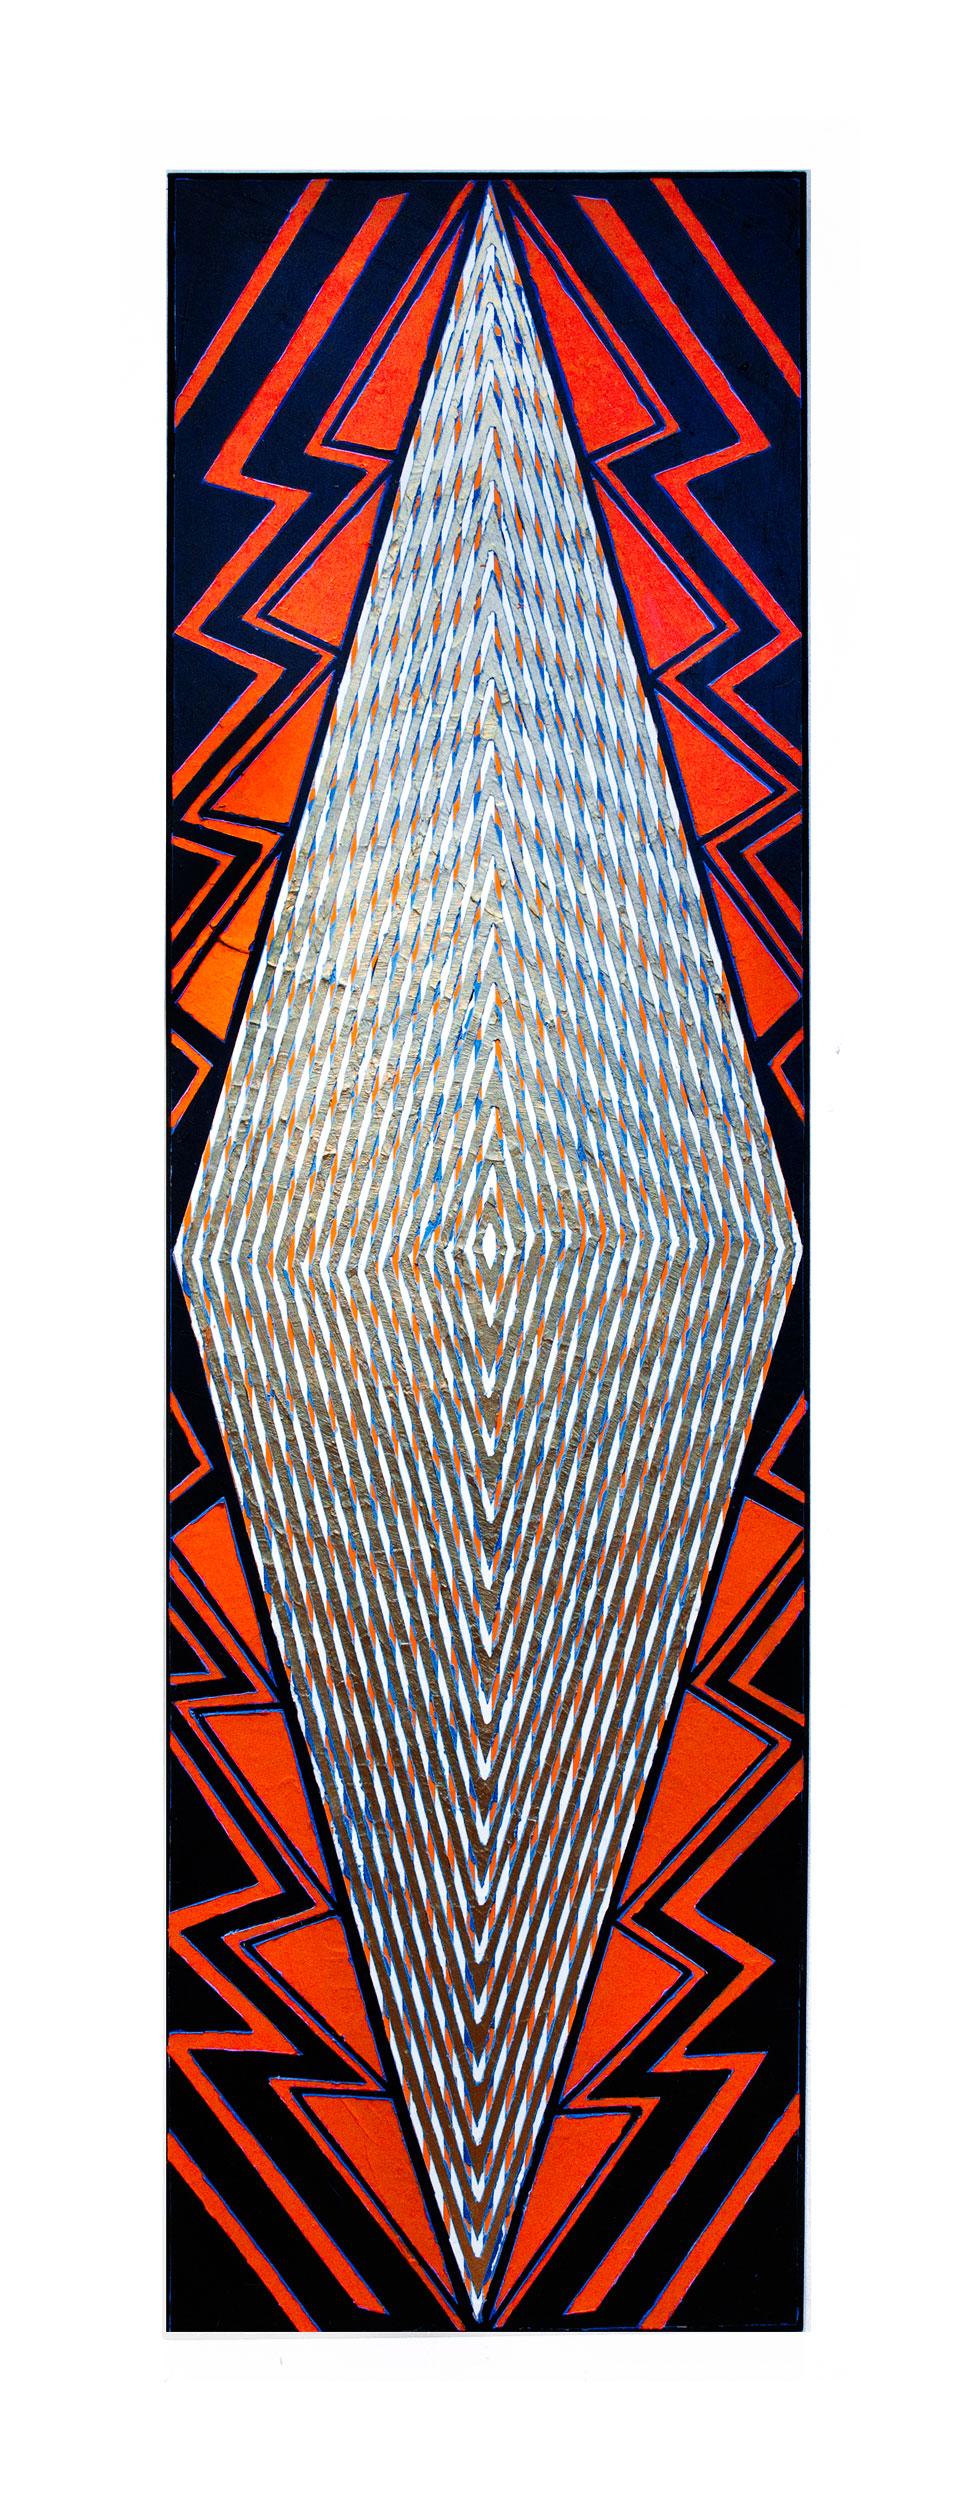 "2015 ""Tall Diamond w. Black & Red (""Brussels"")""  Acrylic on Canvas  84H x 24W"